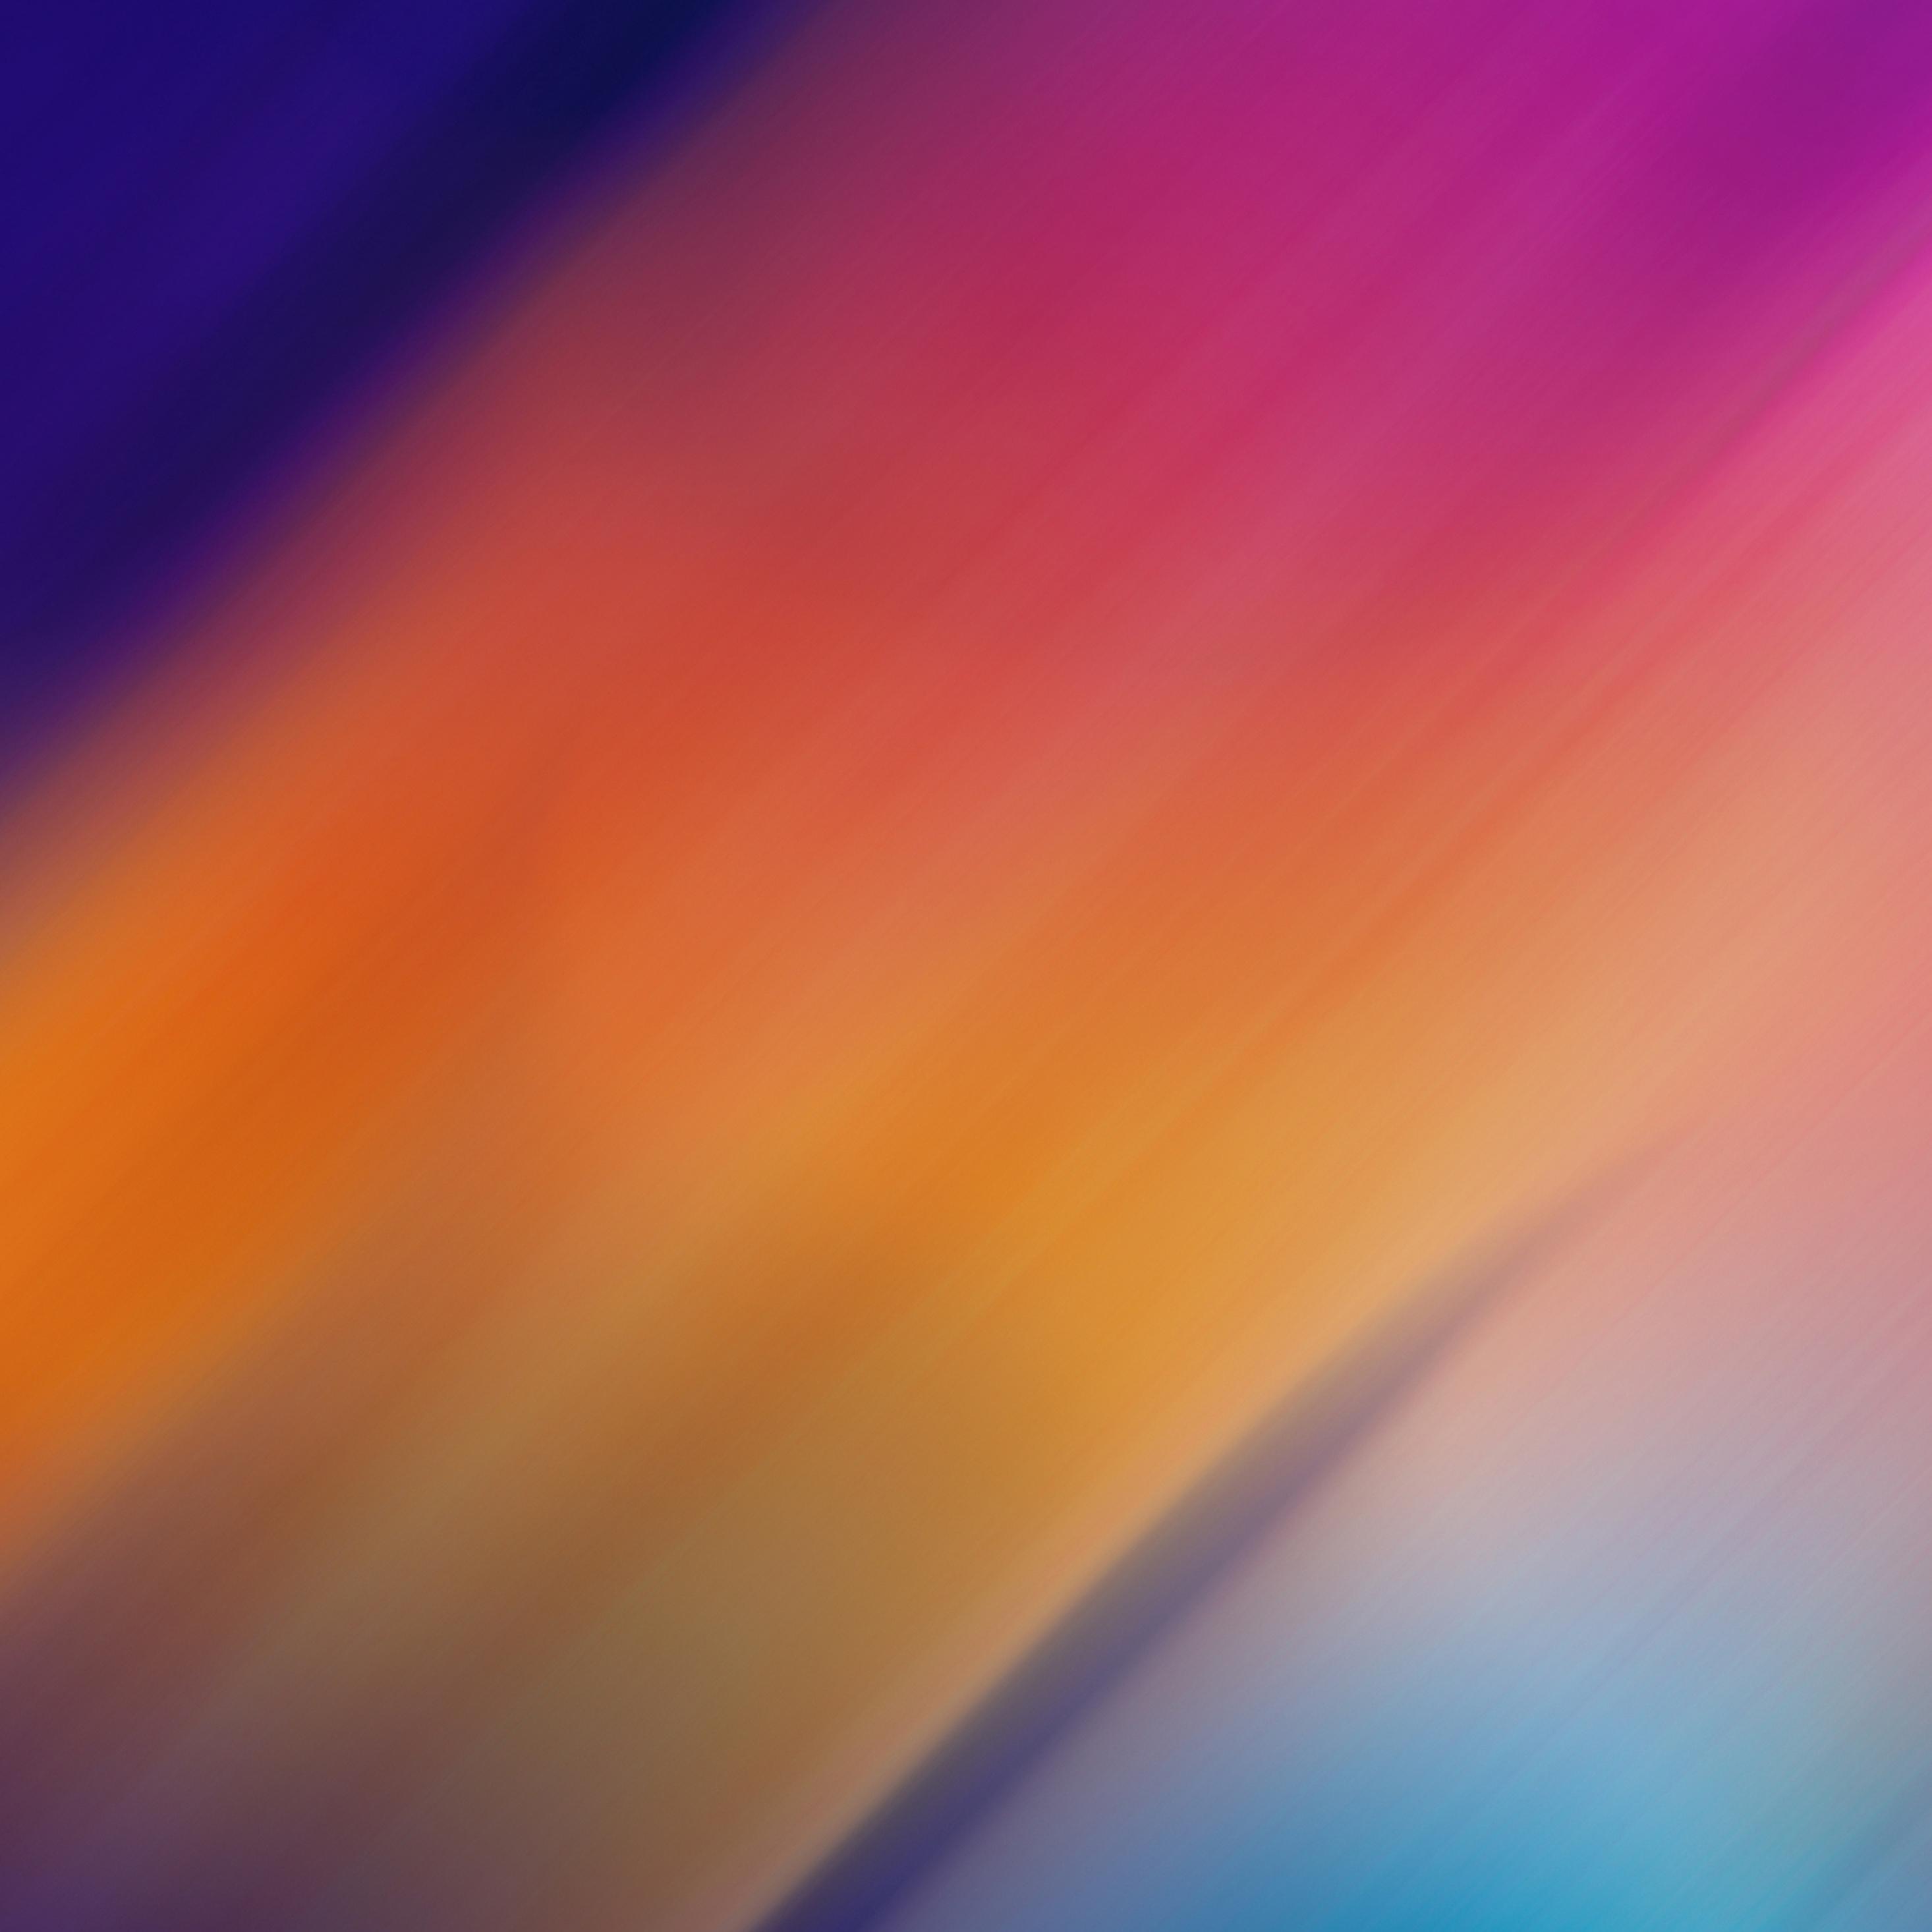 2932x2932 Abstract Gradient Art 4k Ipad Pro Retina Display